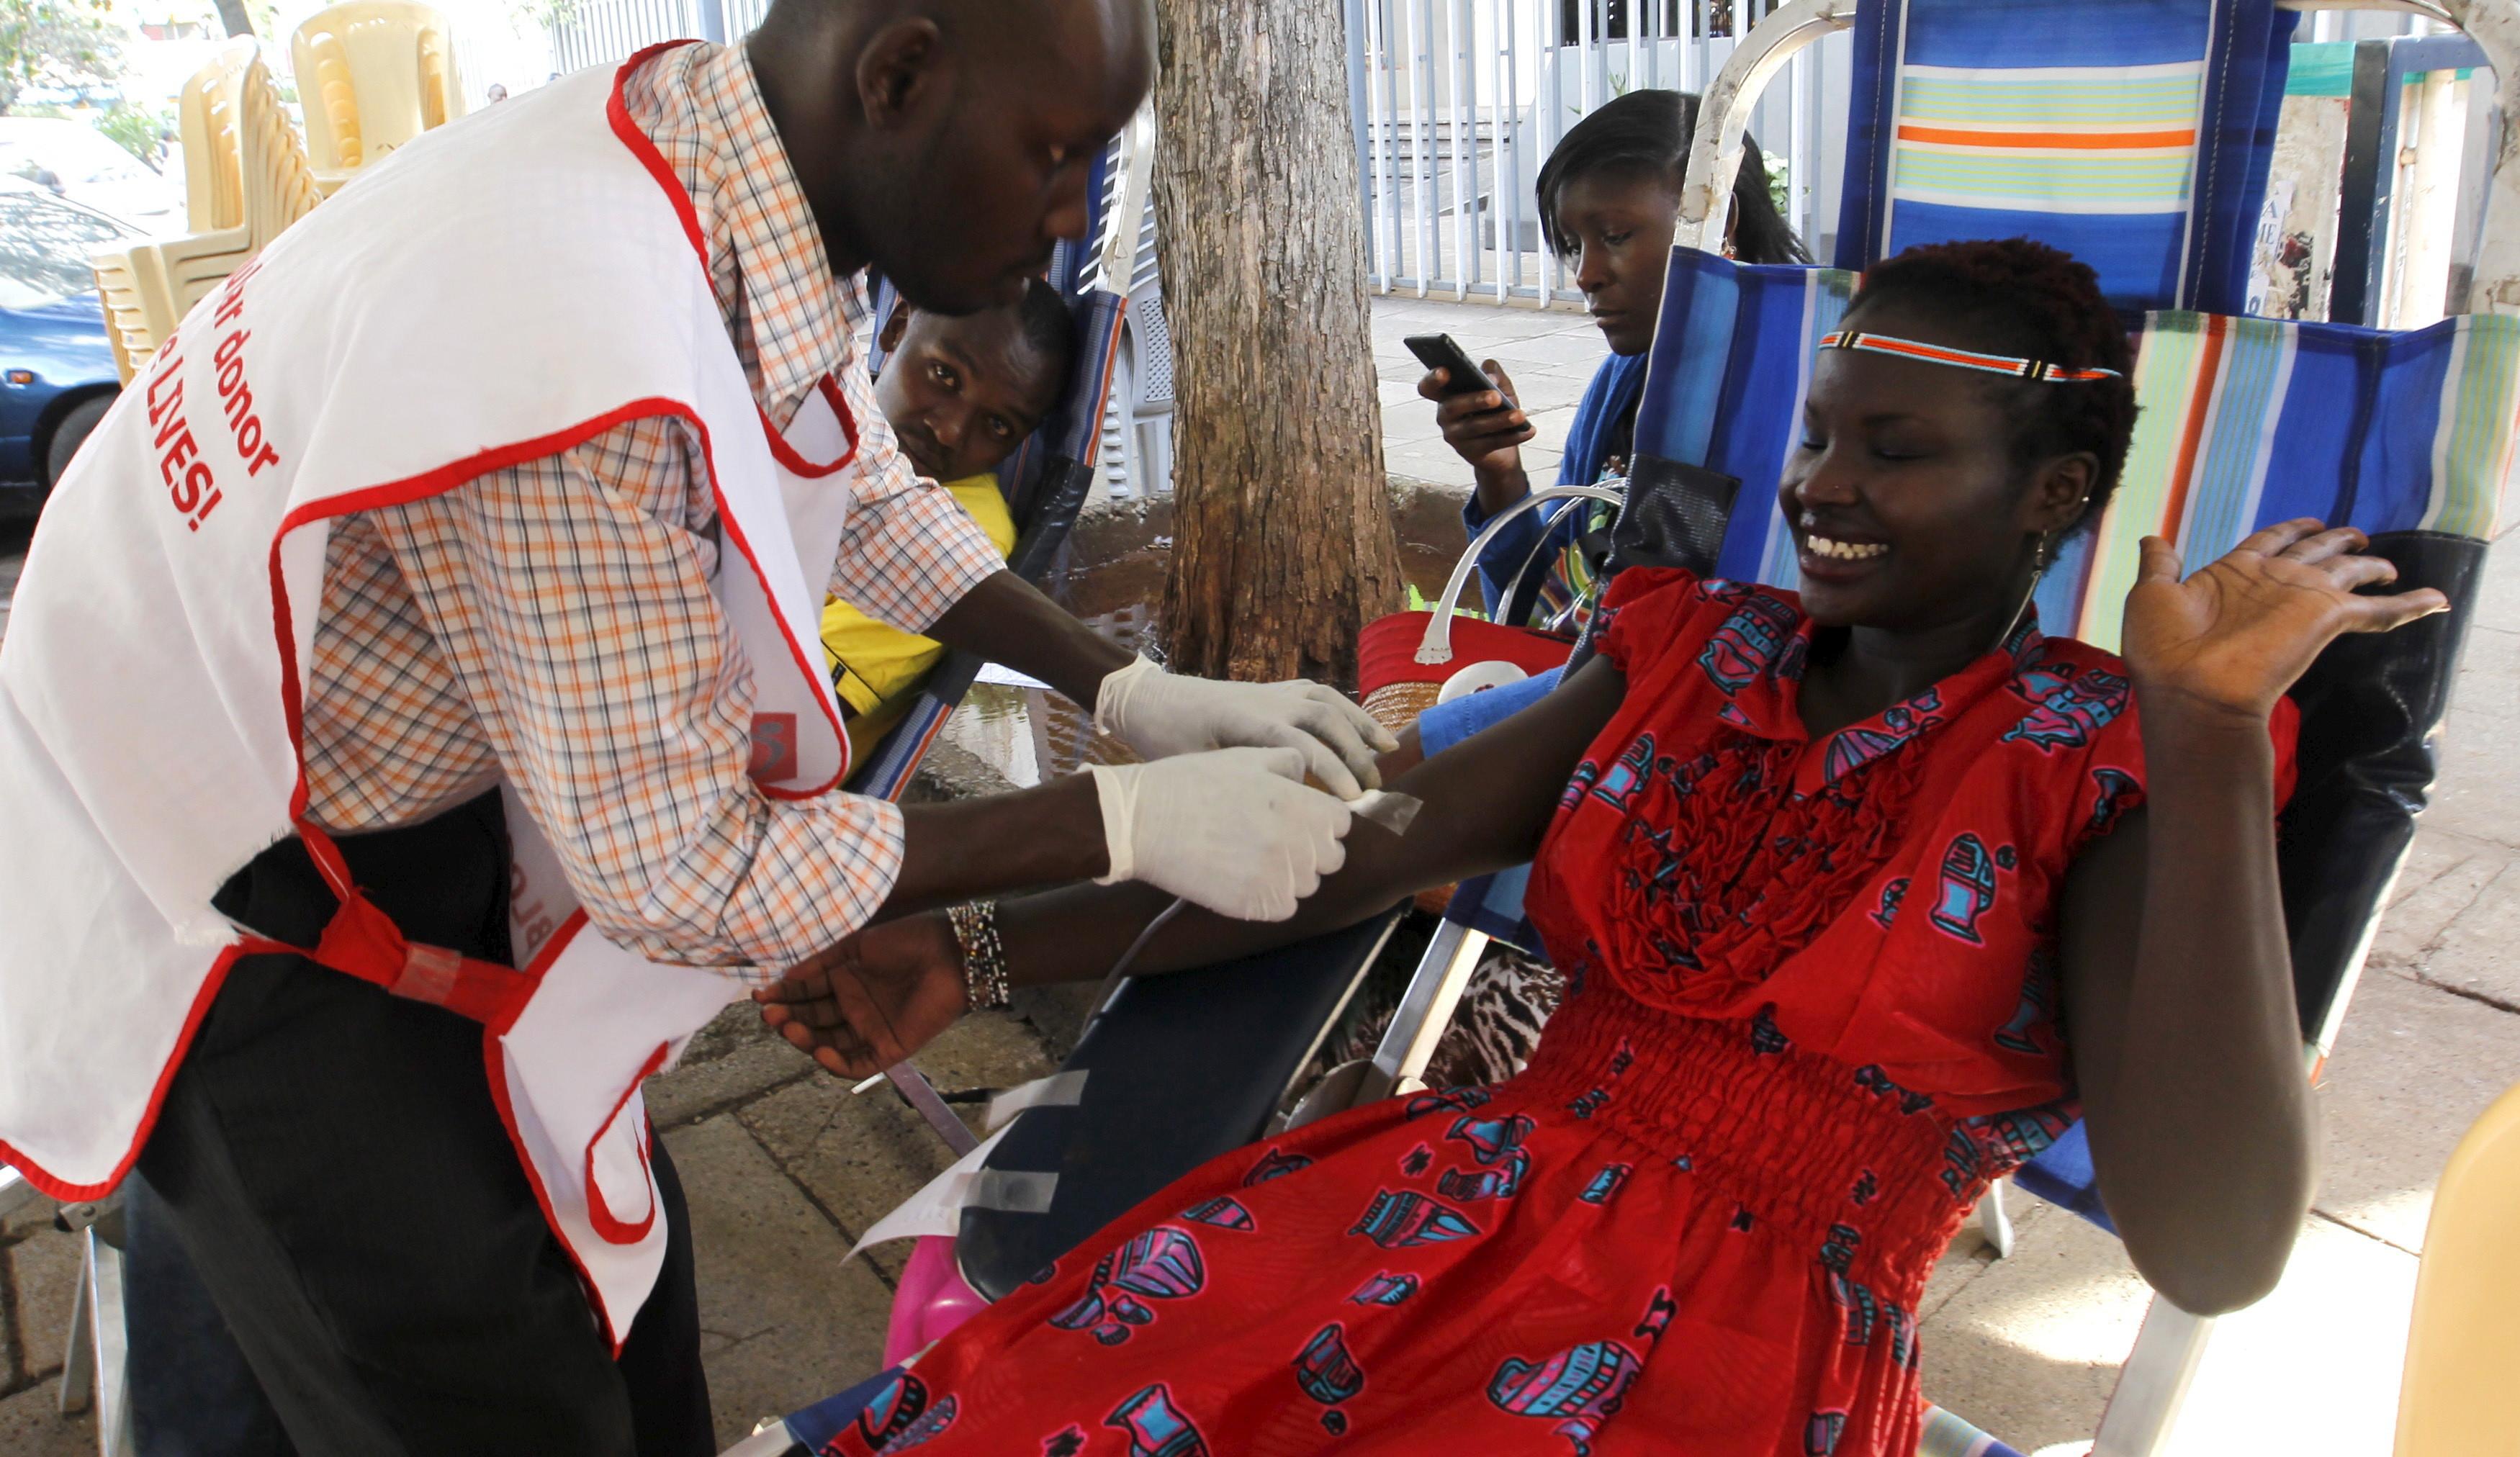 A woman donates blood in Kenya.